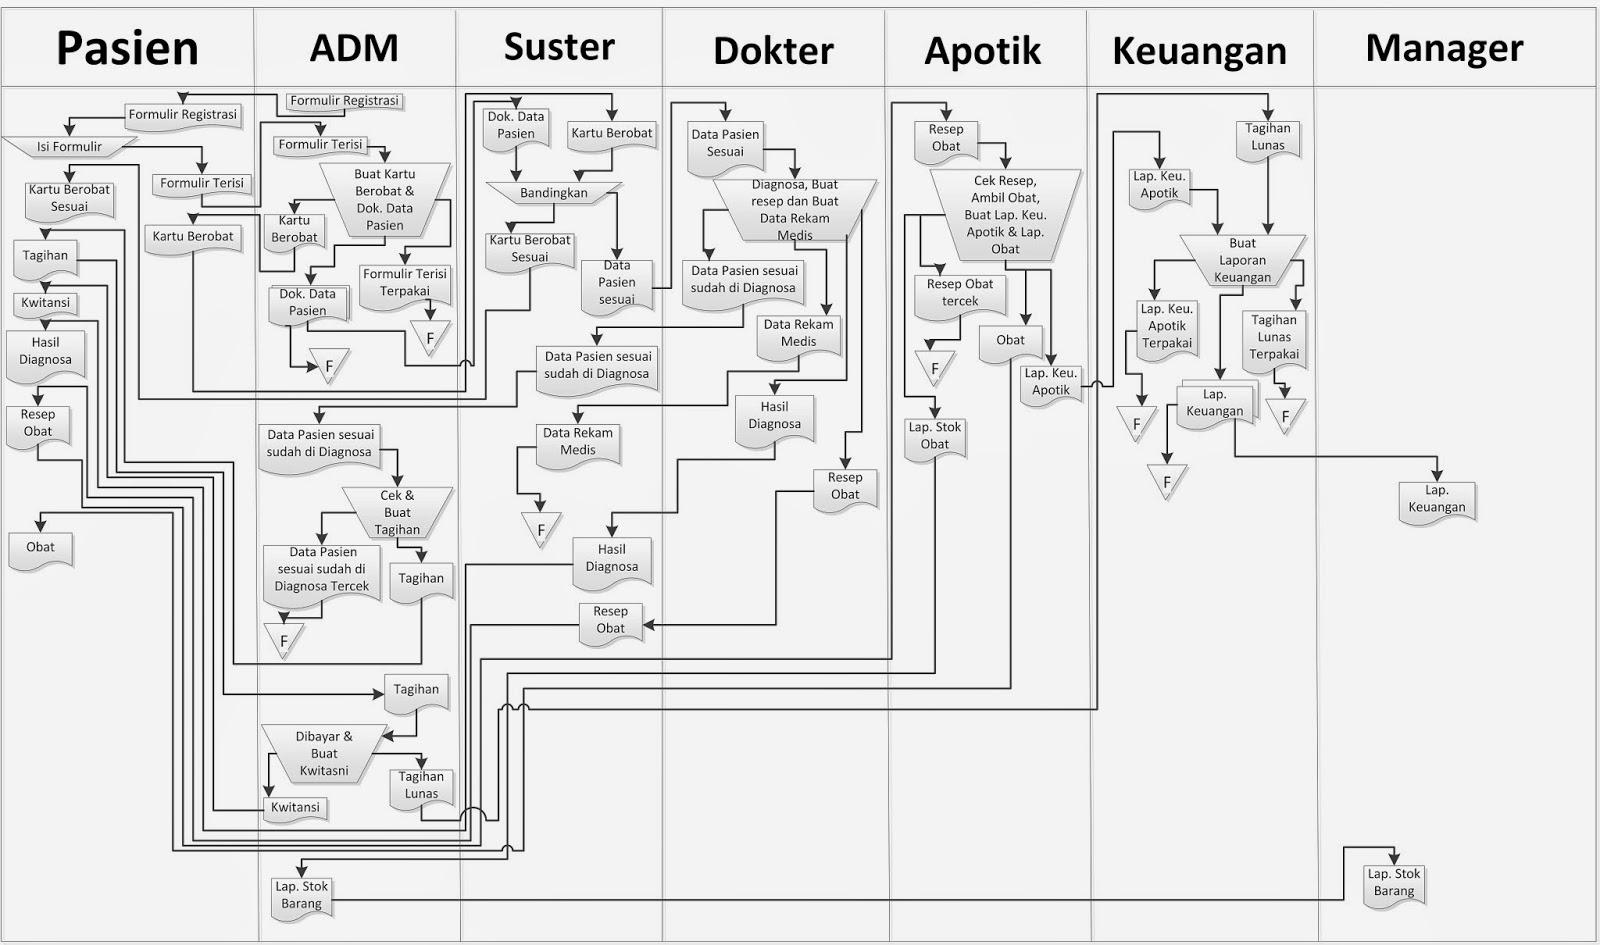 Anak Kos Entertainment  Contoh Diagram Asi Rumah Sakit